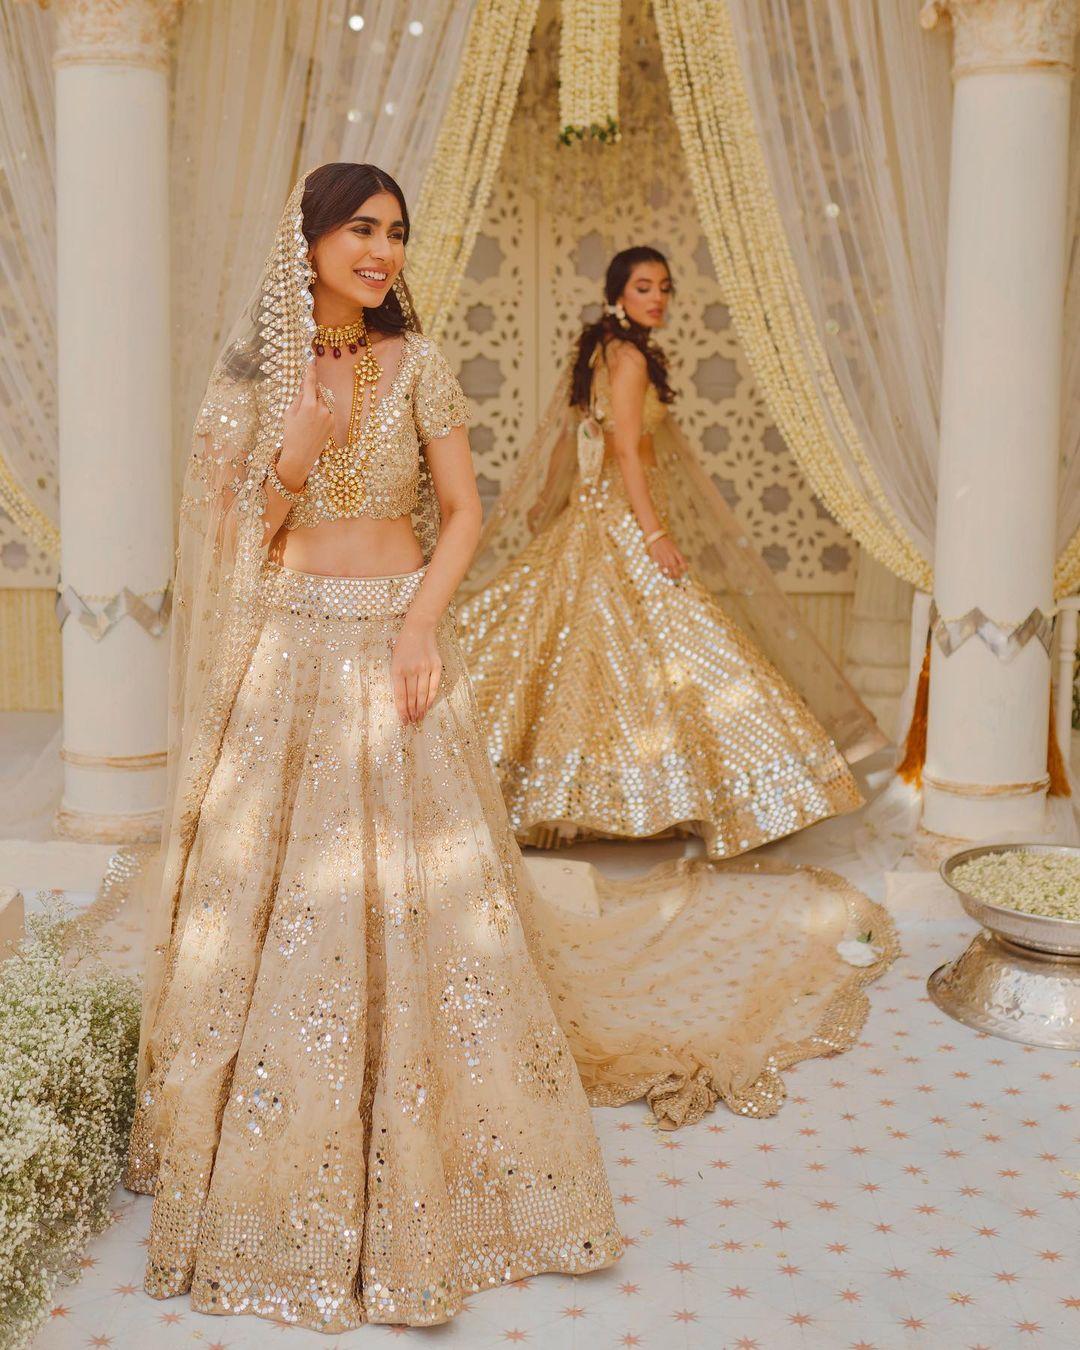 Stunning gold shade bridal lehenga set with hand  embroidery mirror work. 2021-06-16